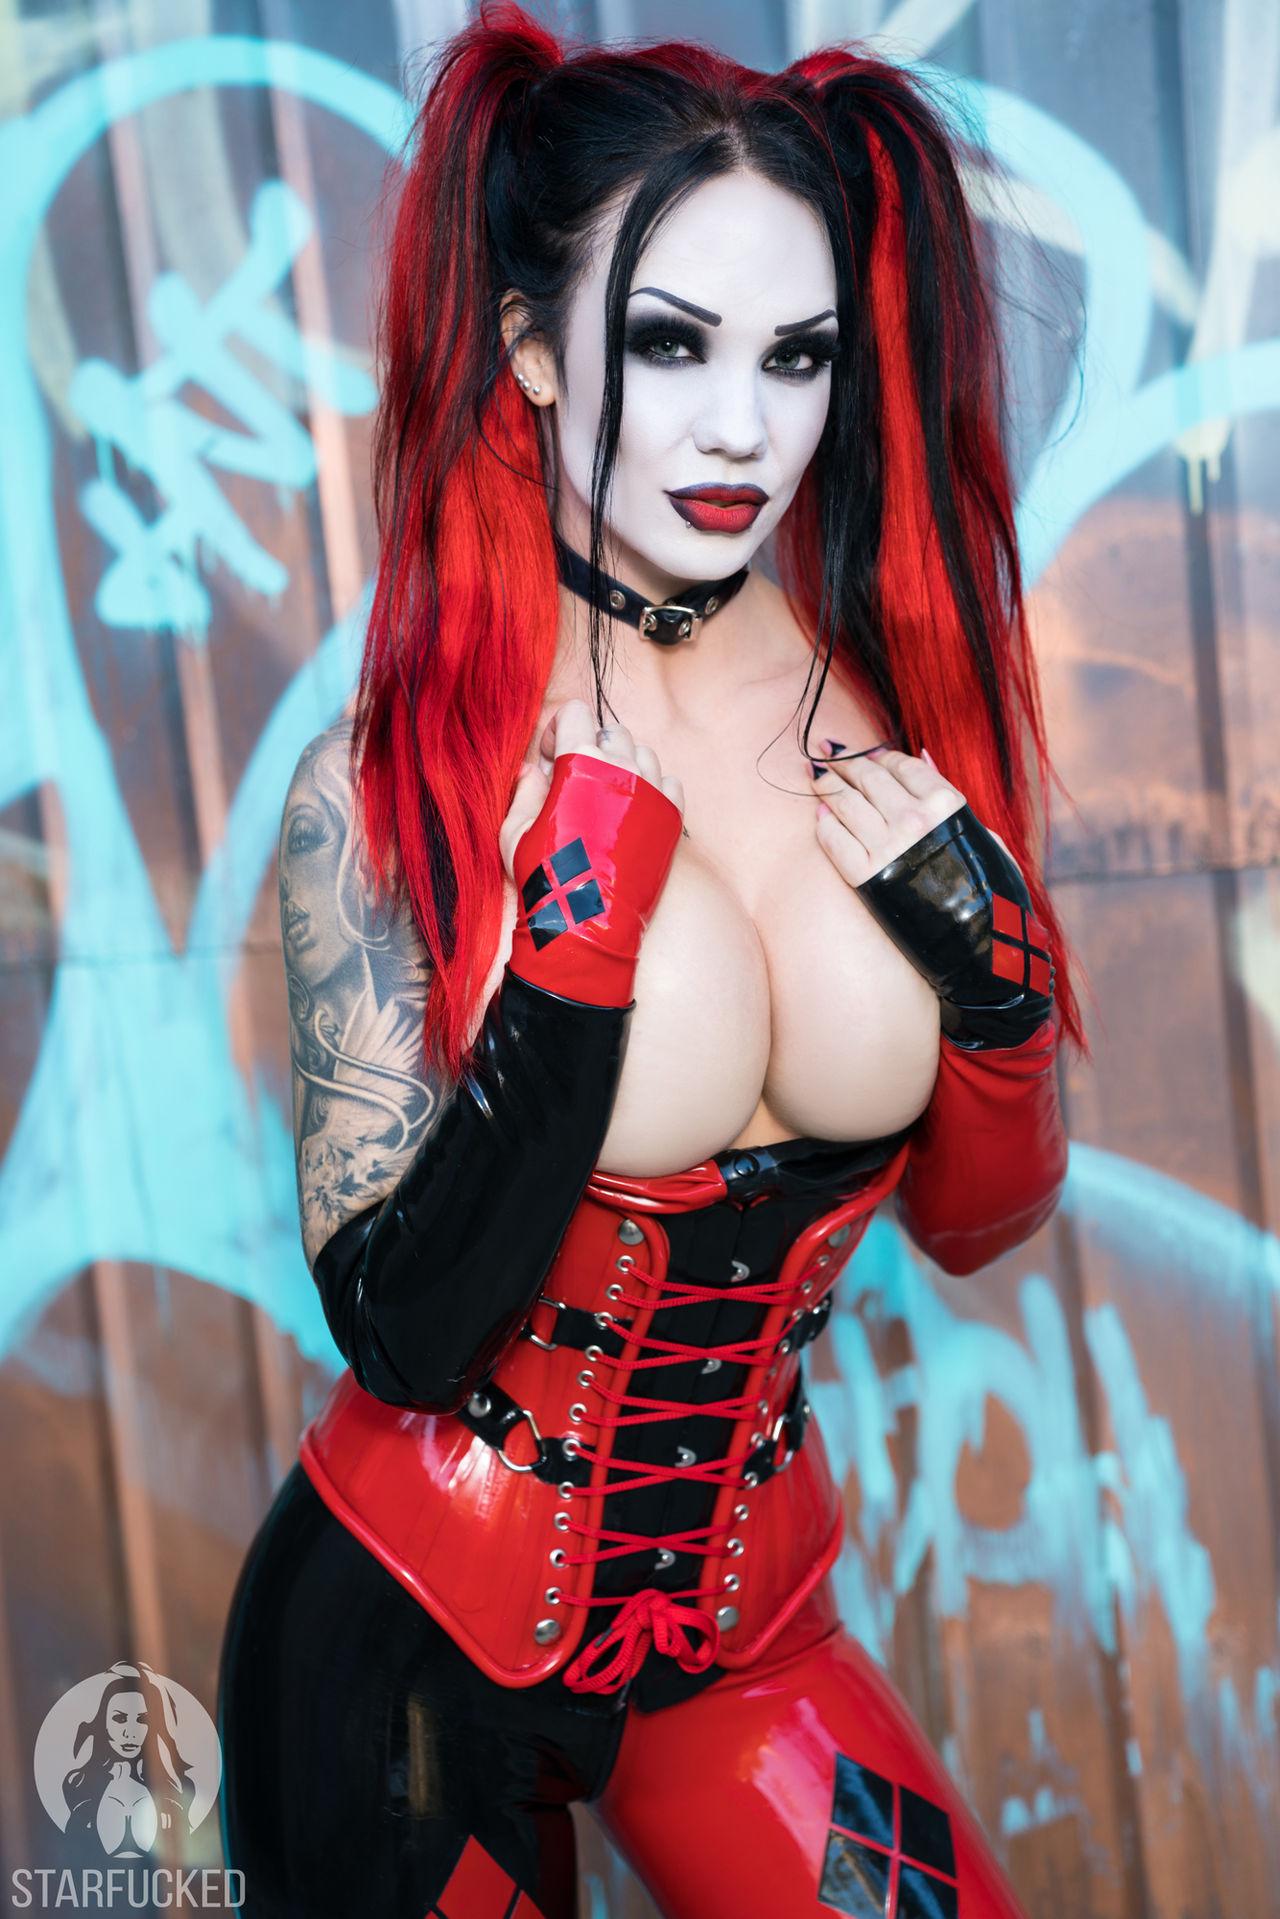 Starfucked Harley Quinn Arkham Cosplay